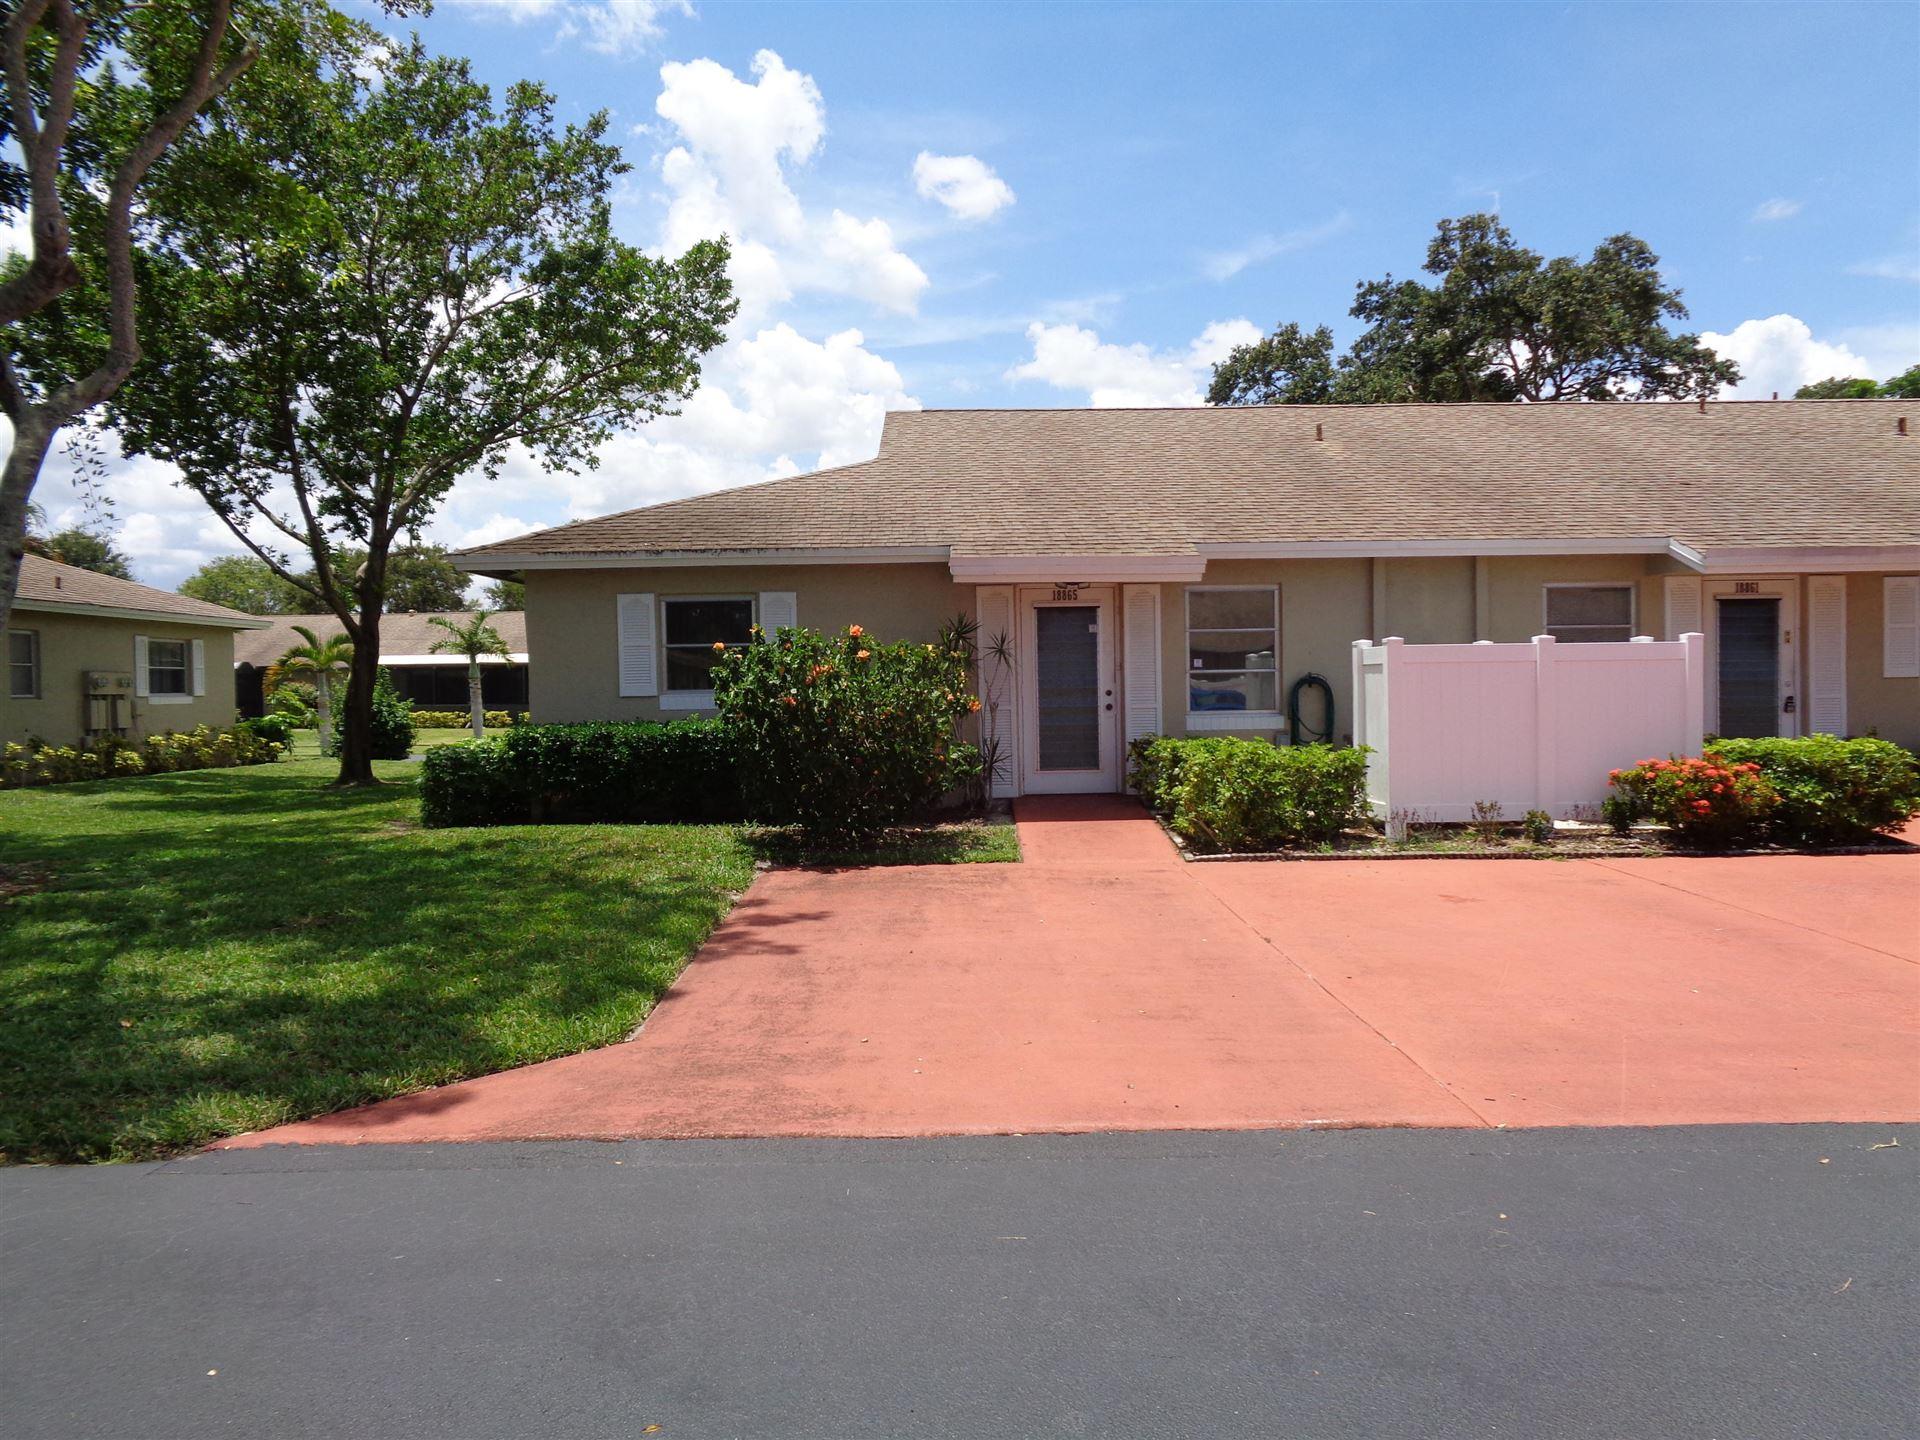 Photo of 18865 Argosy Drive #A, Boca Raton, FL 33496 (MLS # RX-10733700)